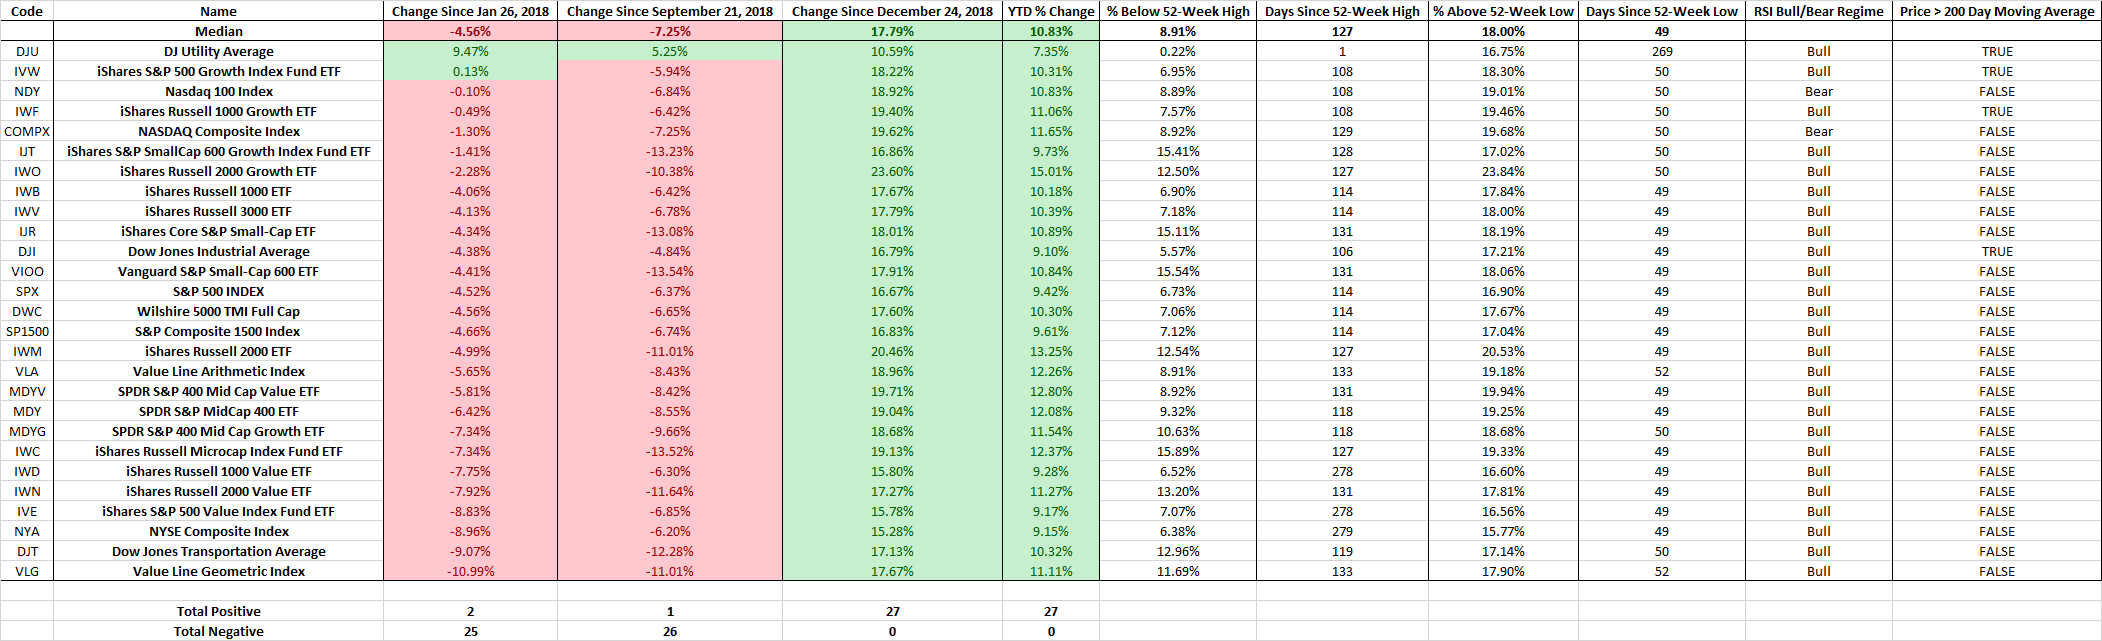 Market Breadth Statistics